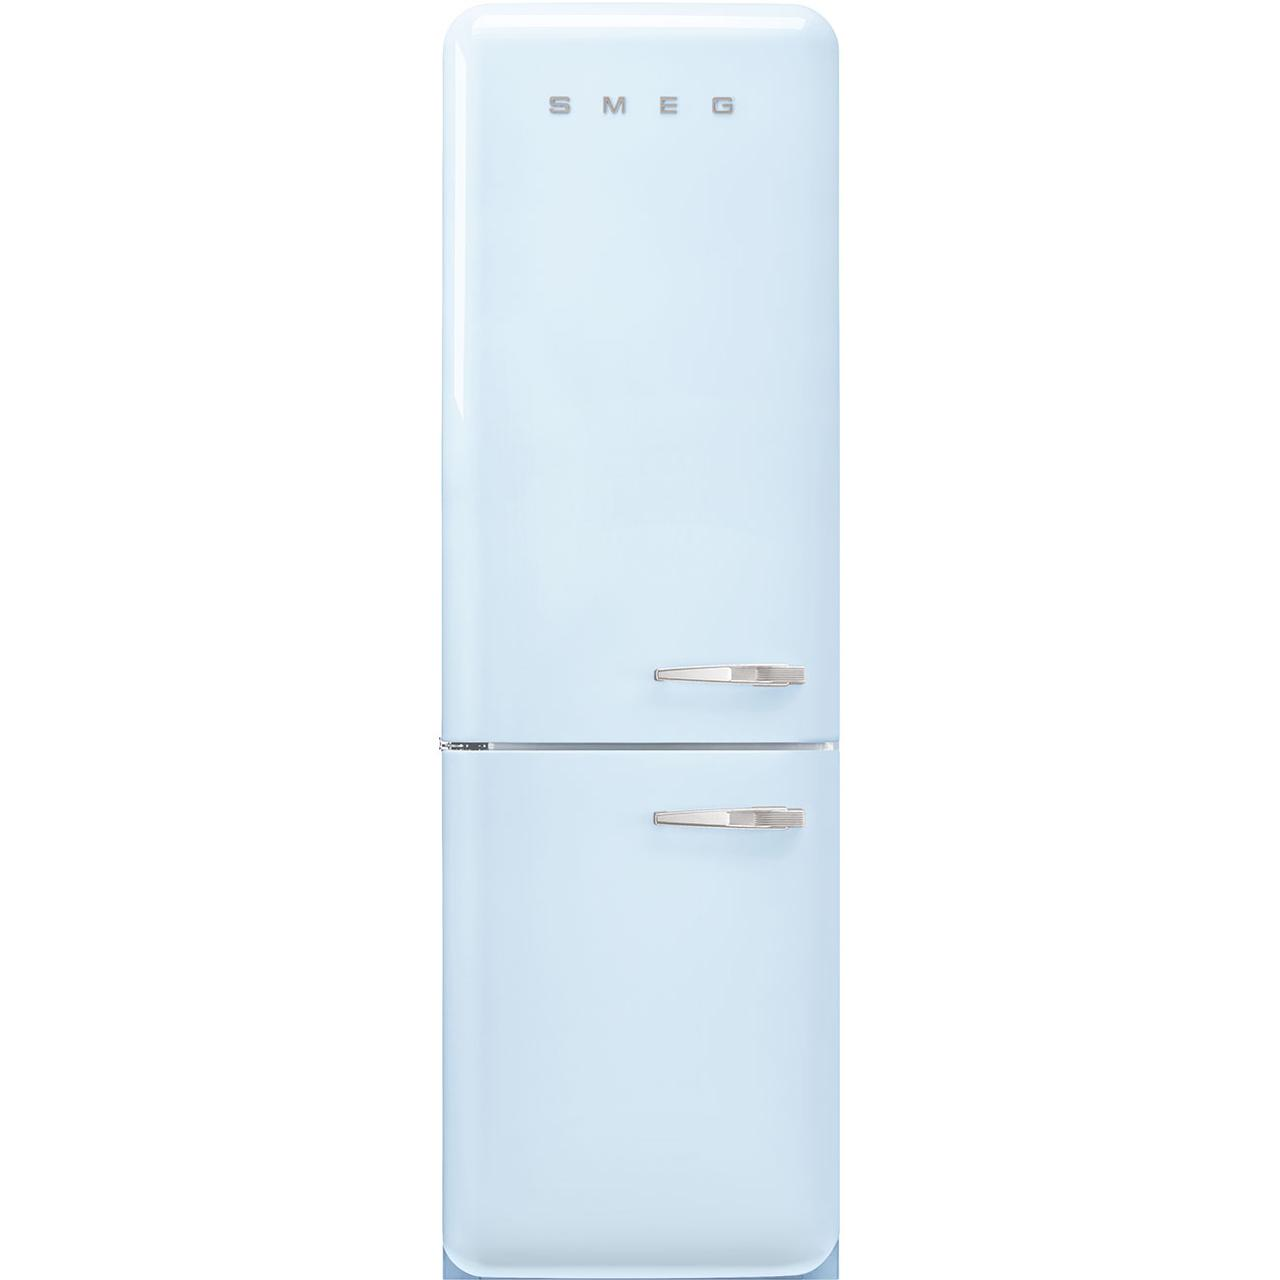 Холодильник Smeg FAB32LPB5, FAB32LPB5, FAB32RPG5,FAB32LPG5